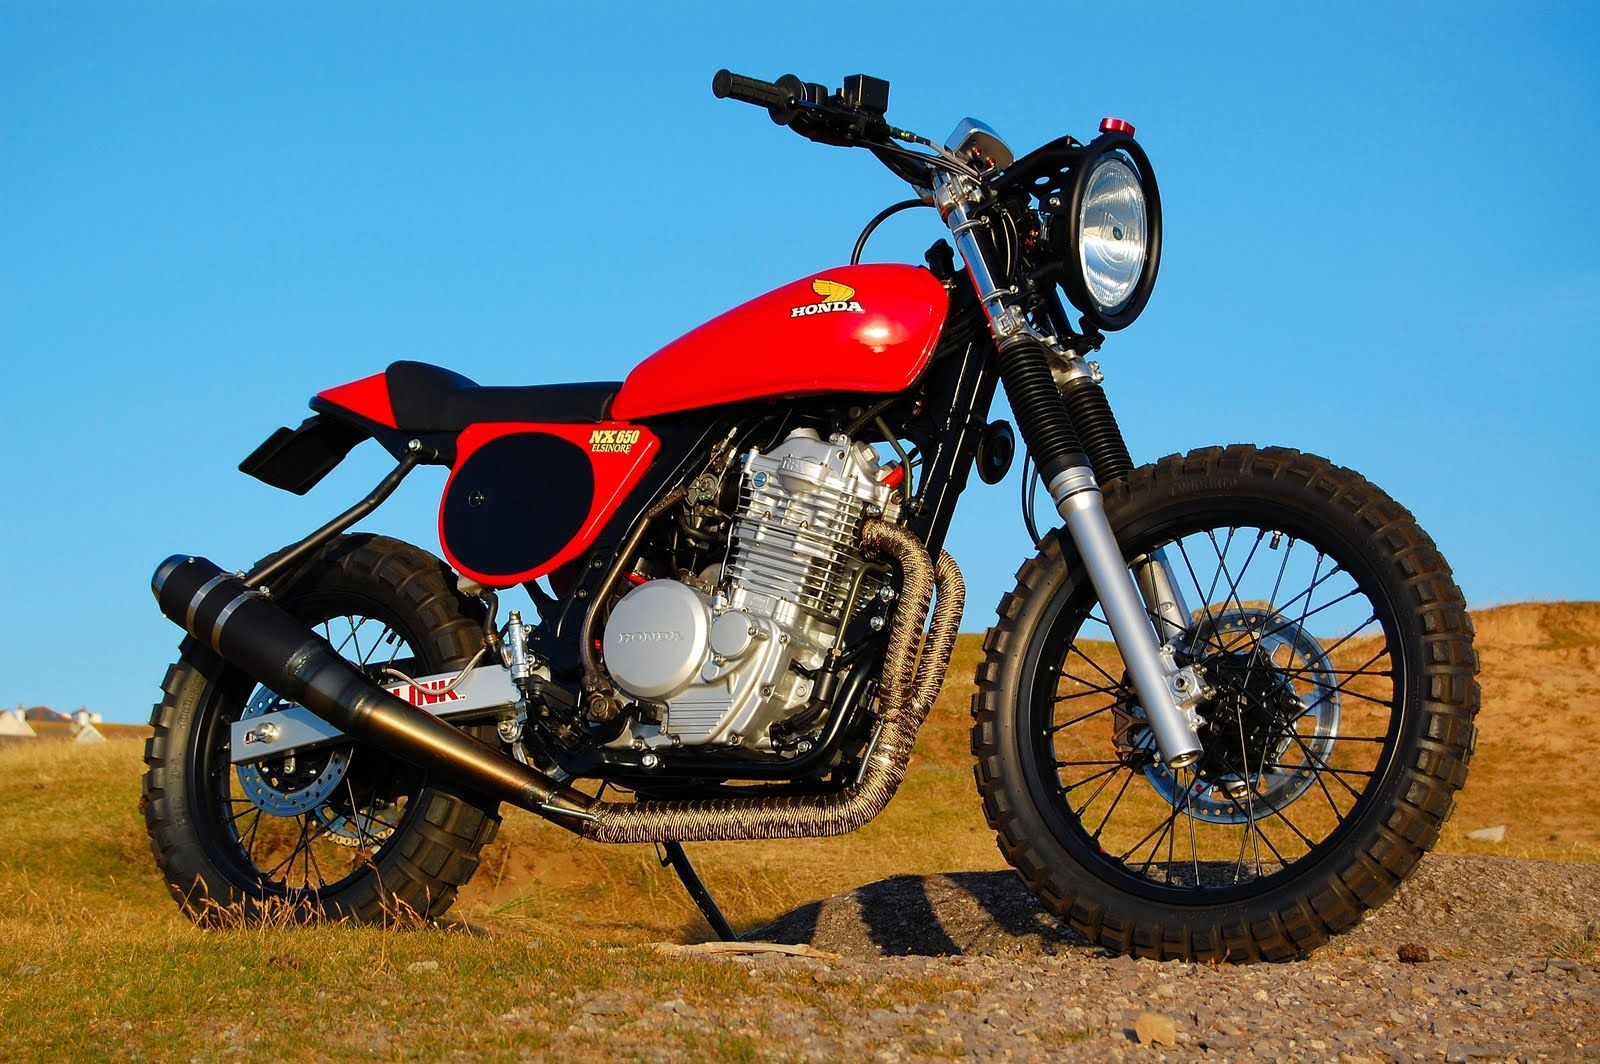 Honda Dominator NX650 – The retro dirtbike | CustomZone.info - The custom side